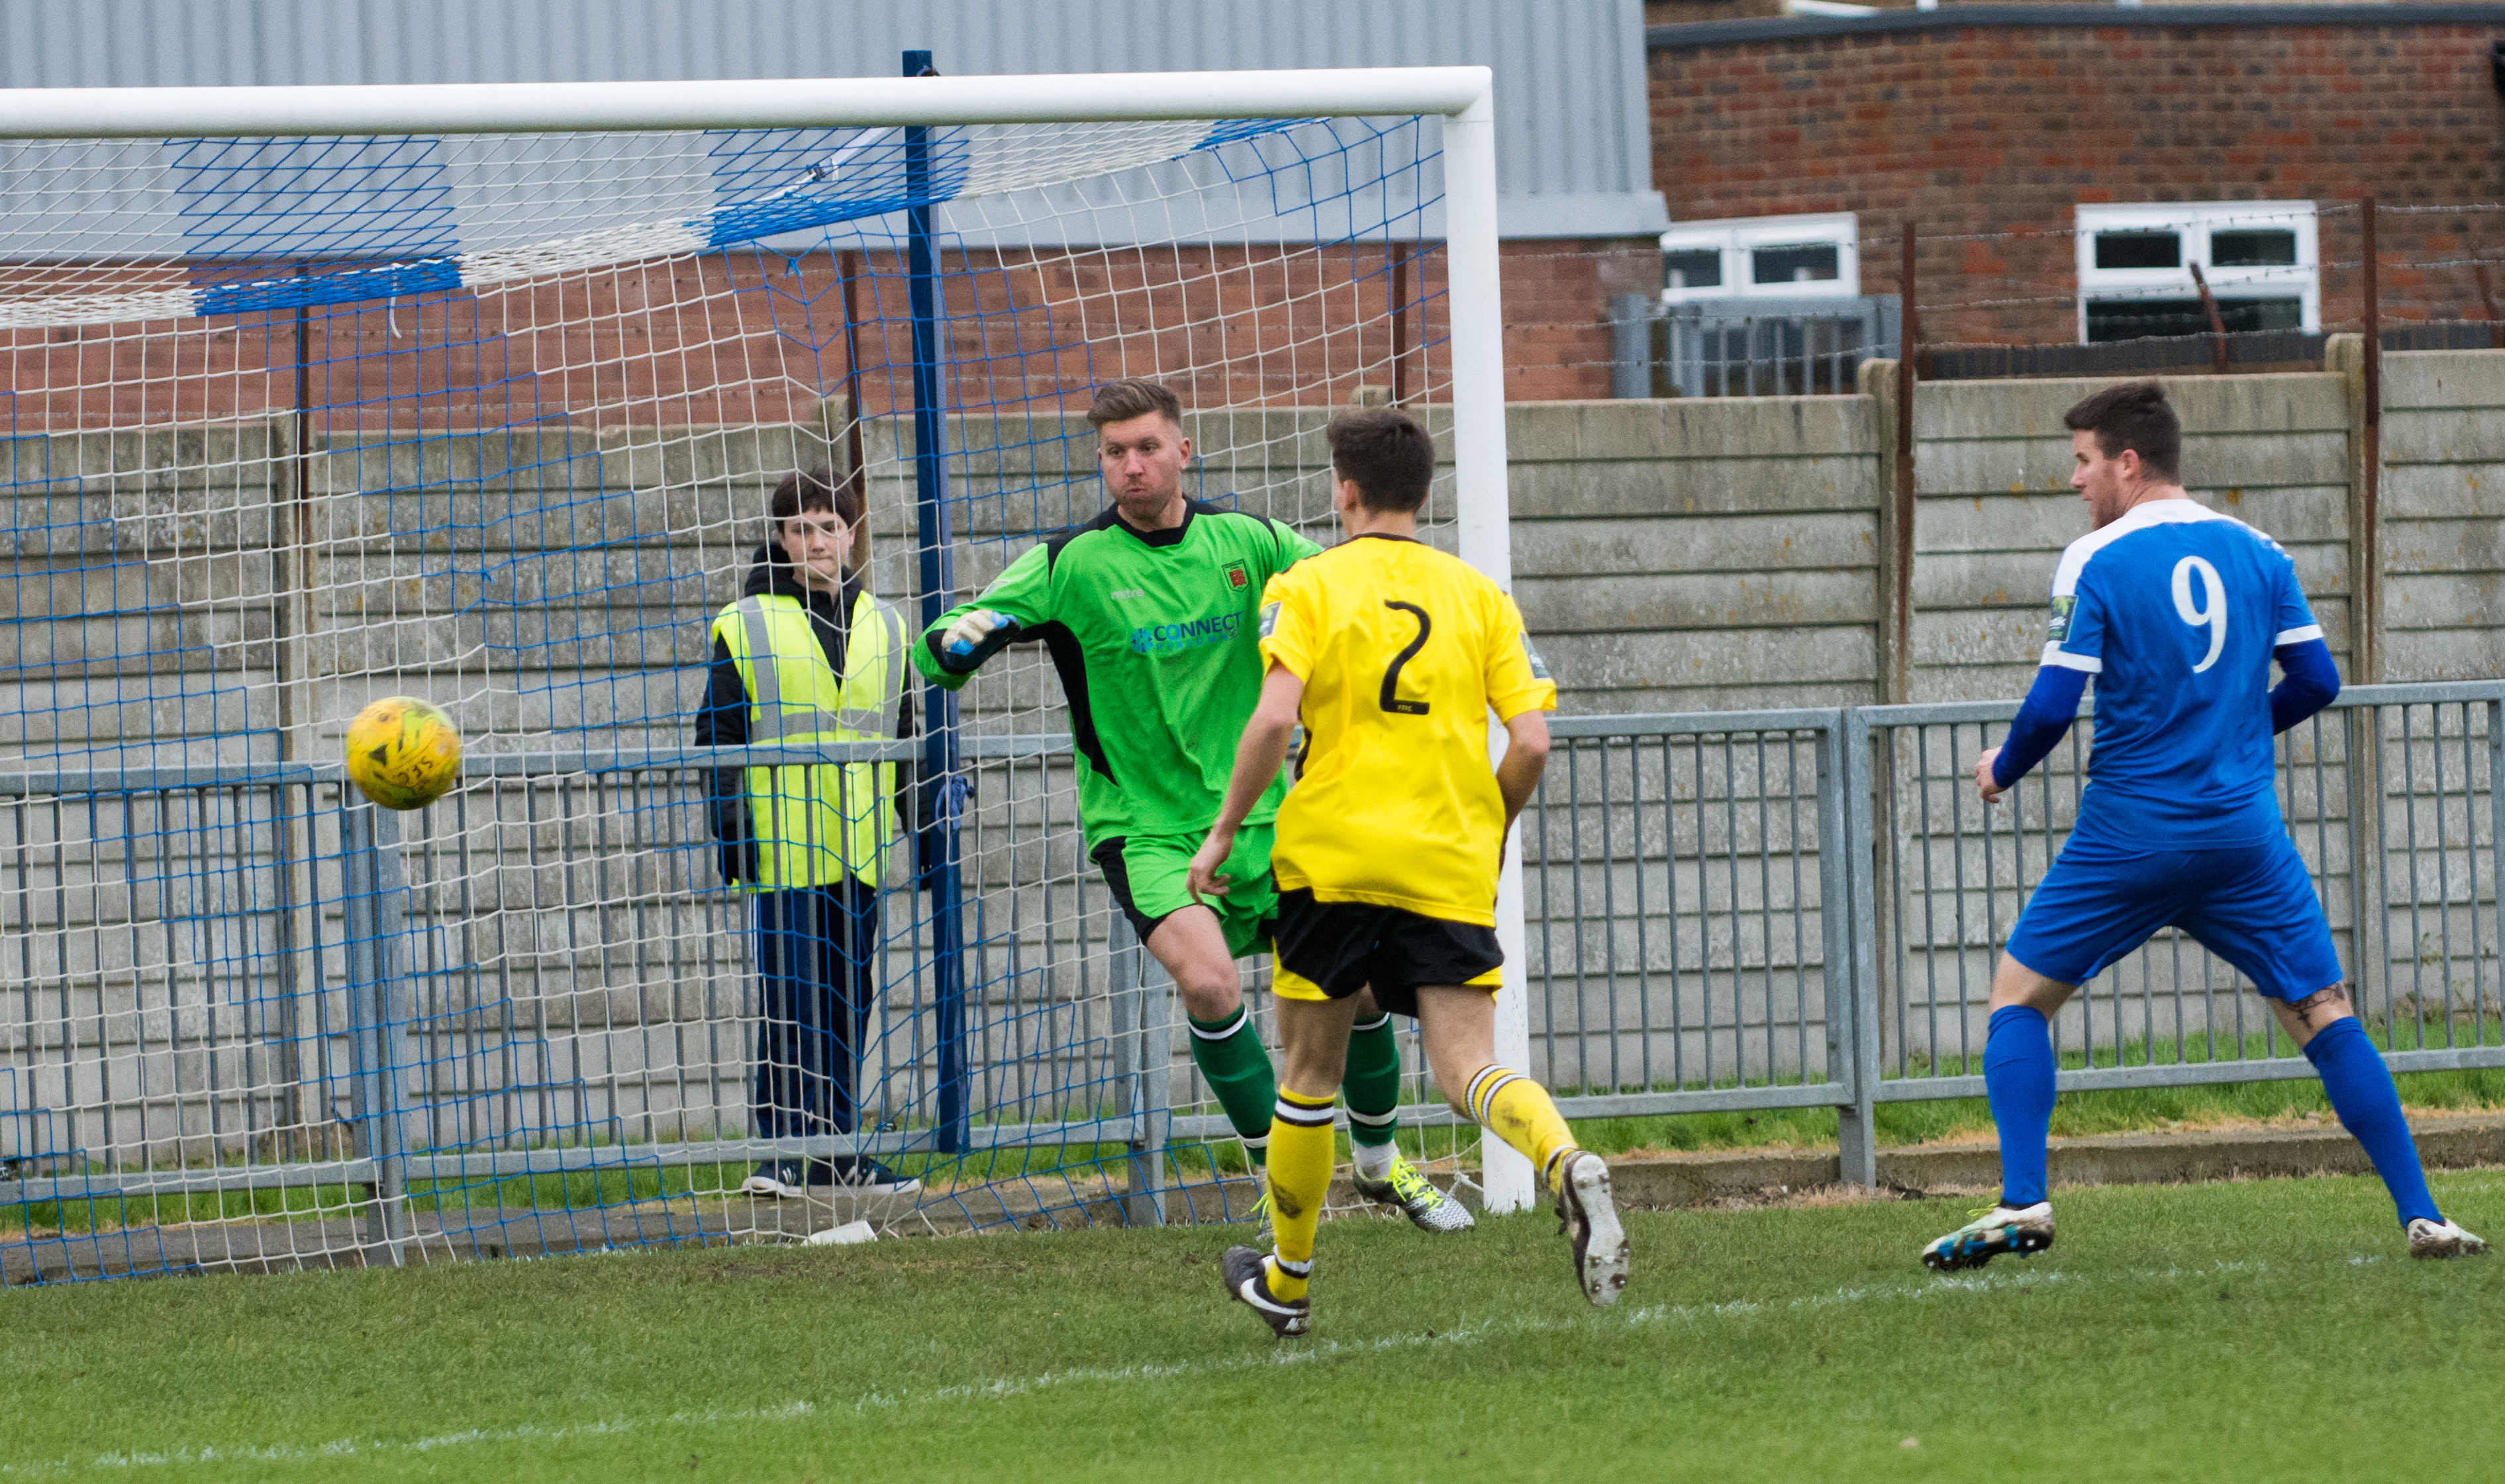 Shoreham FC vs Faversham Town 16.12.17 39